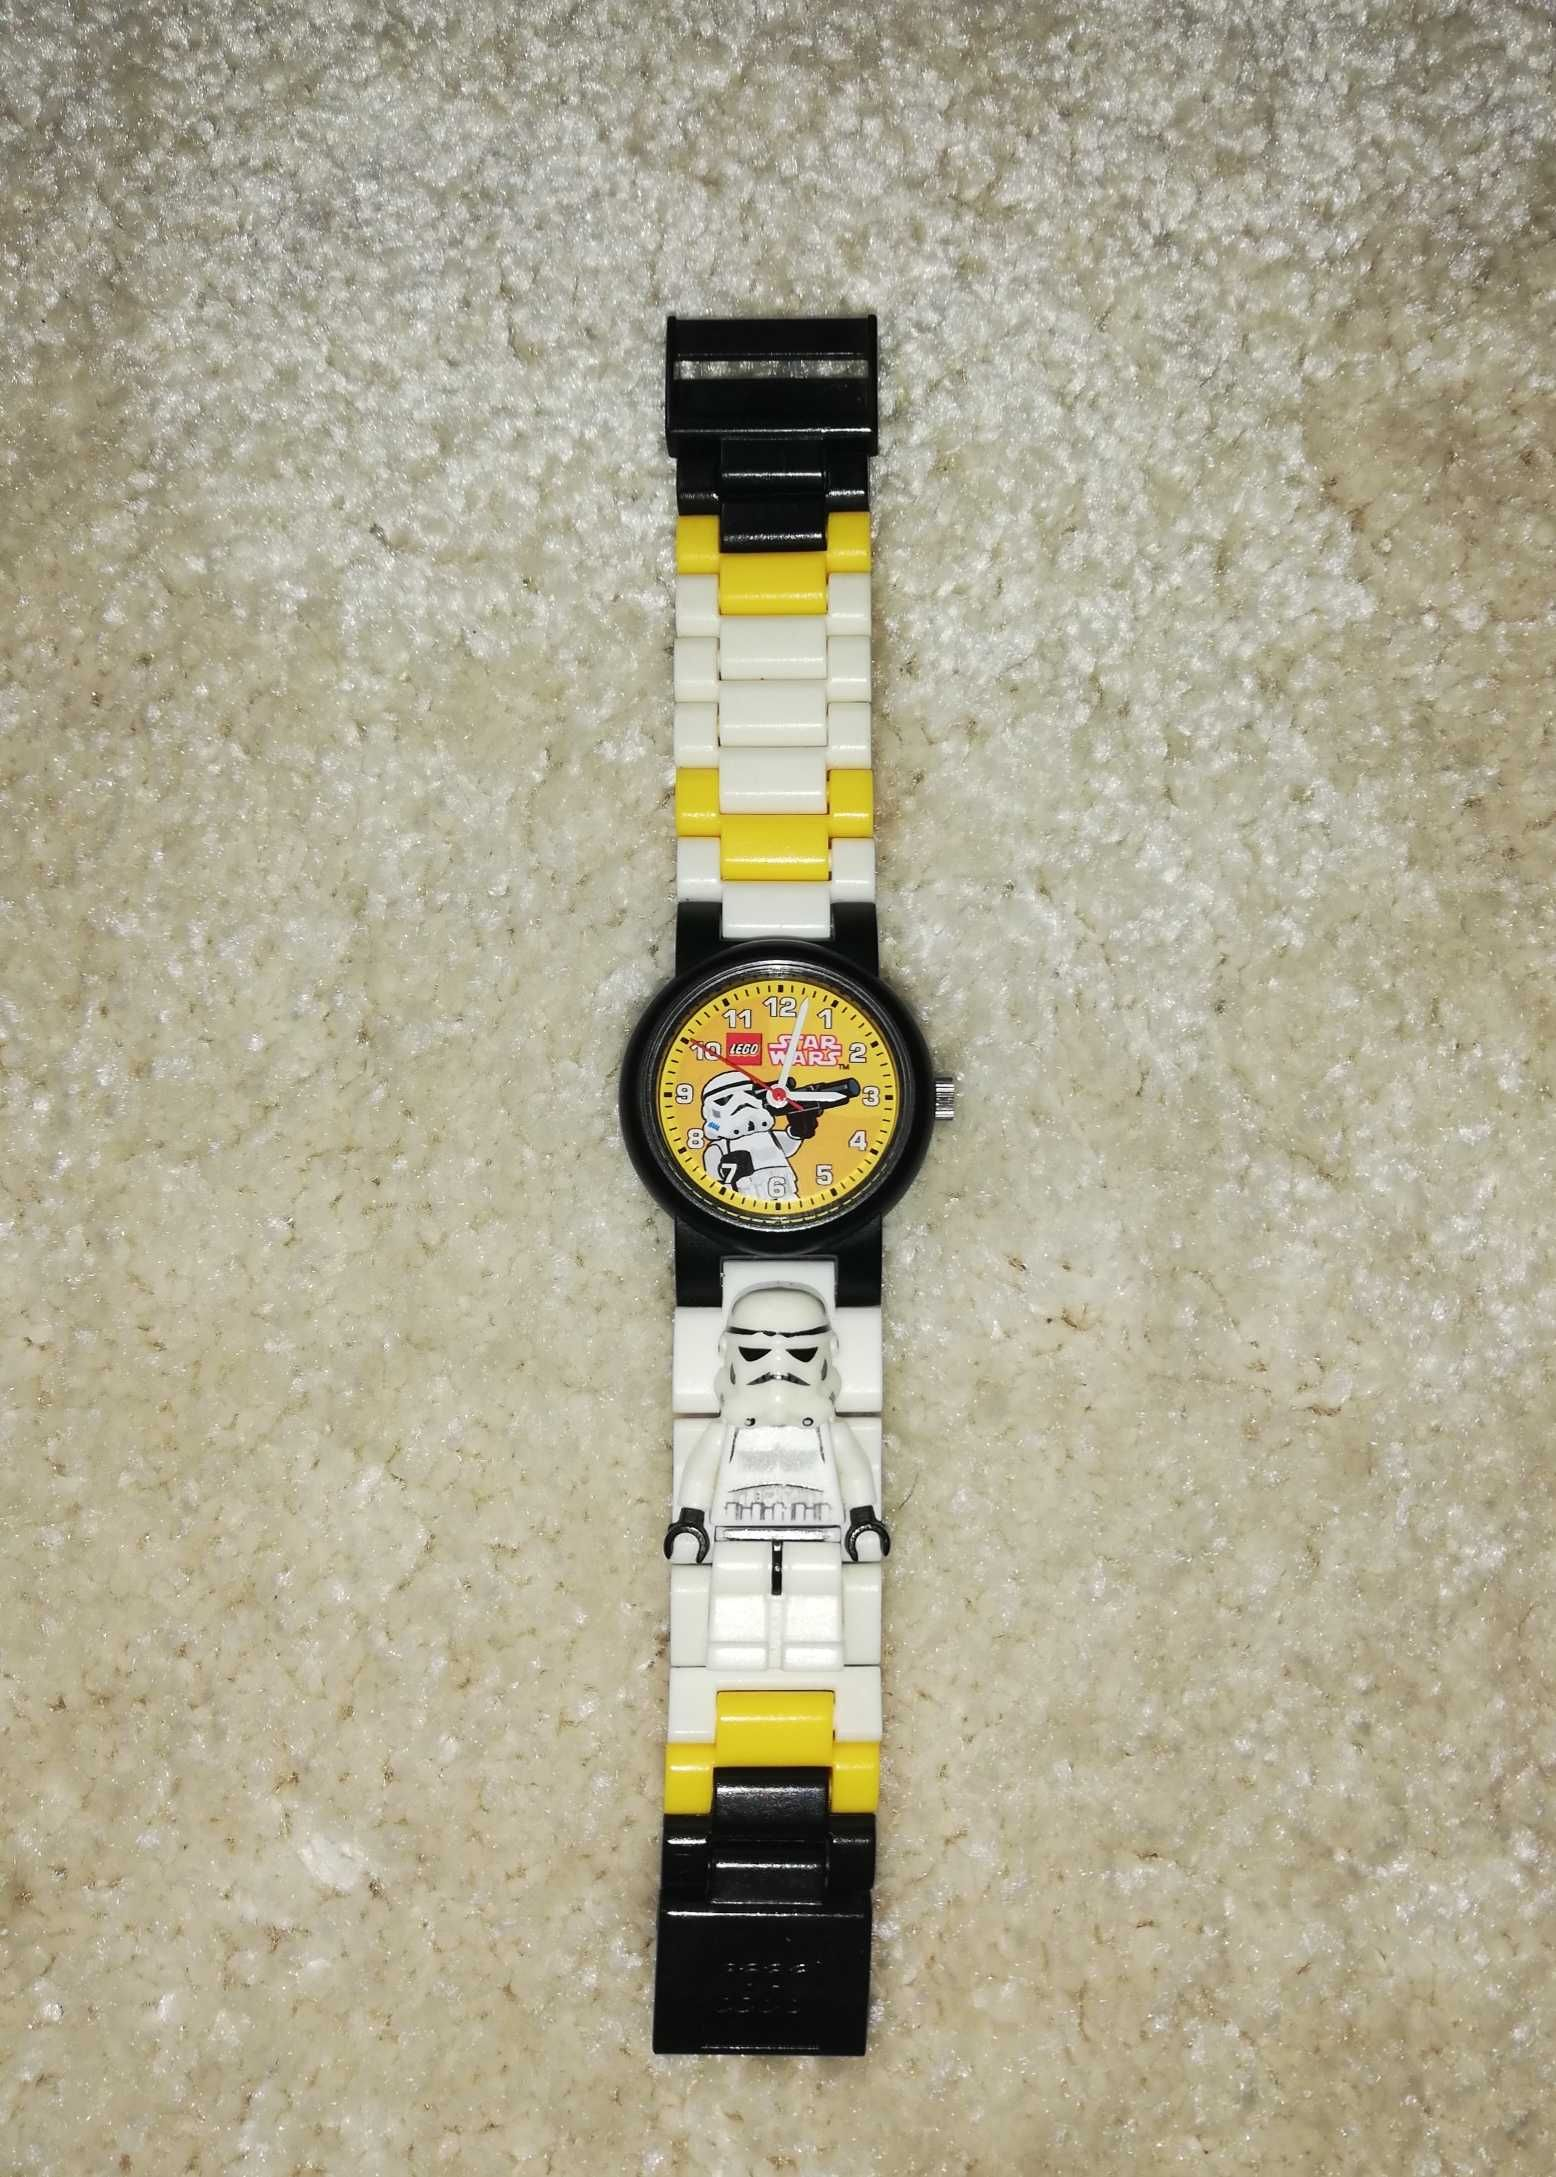 Zegarek Lego Star Wars